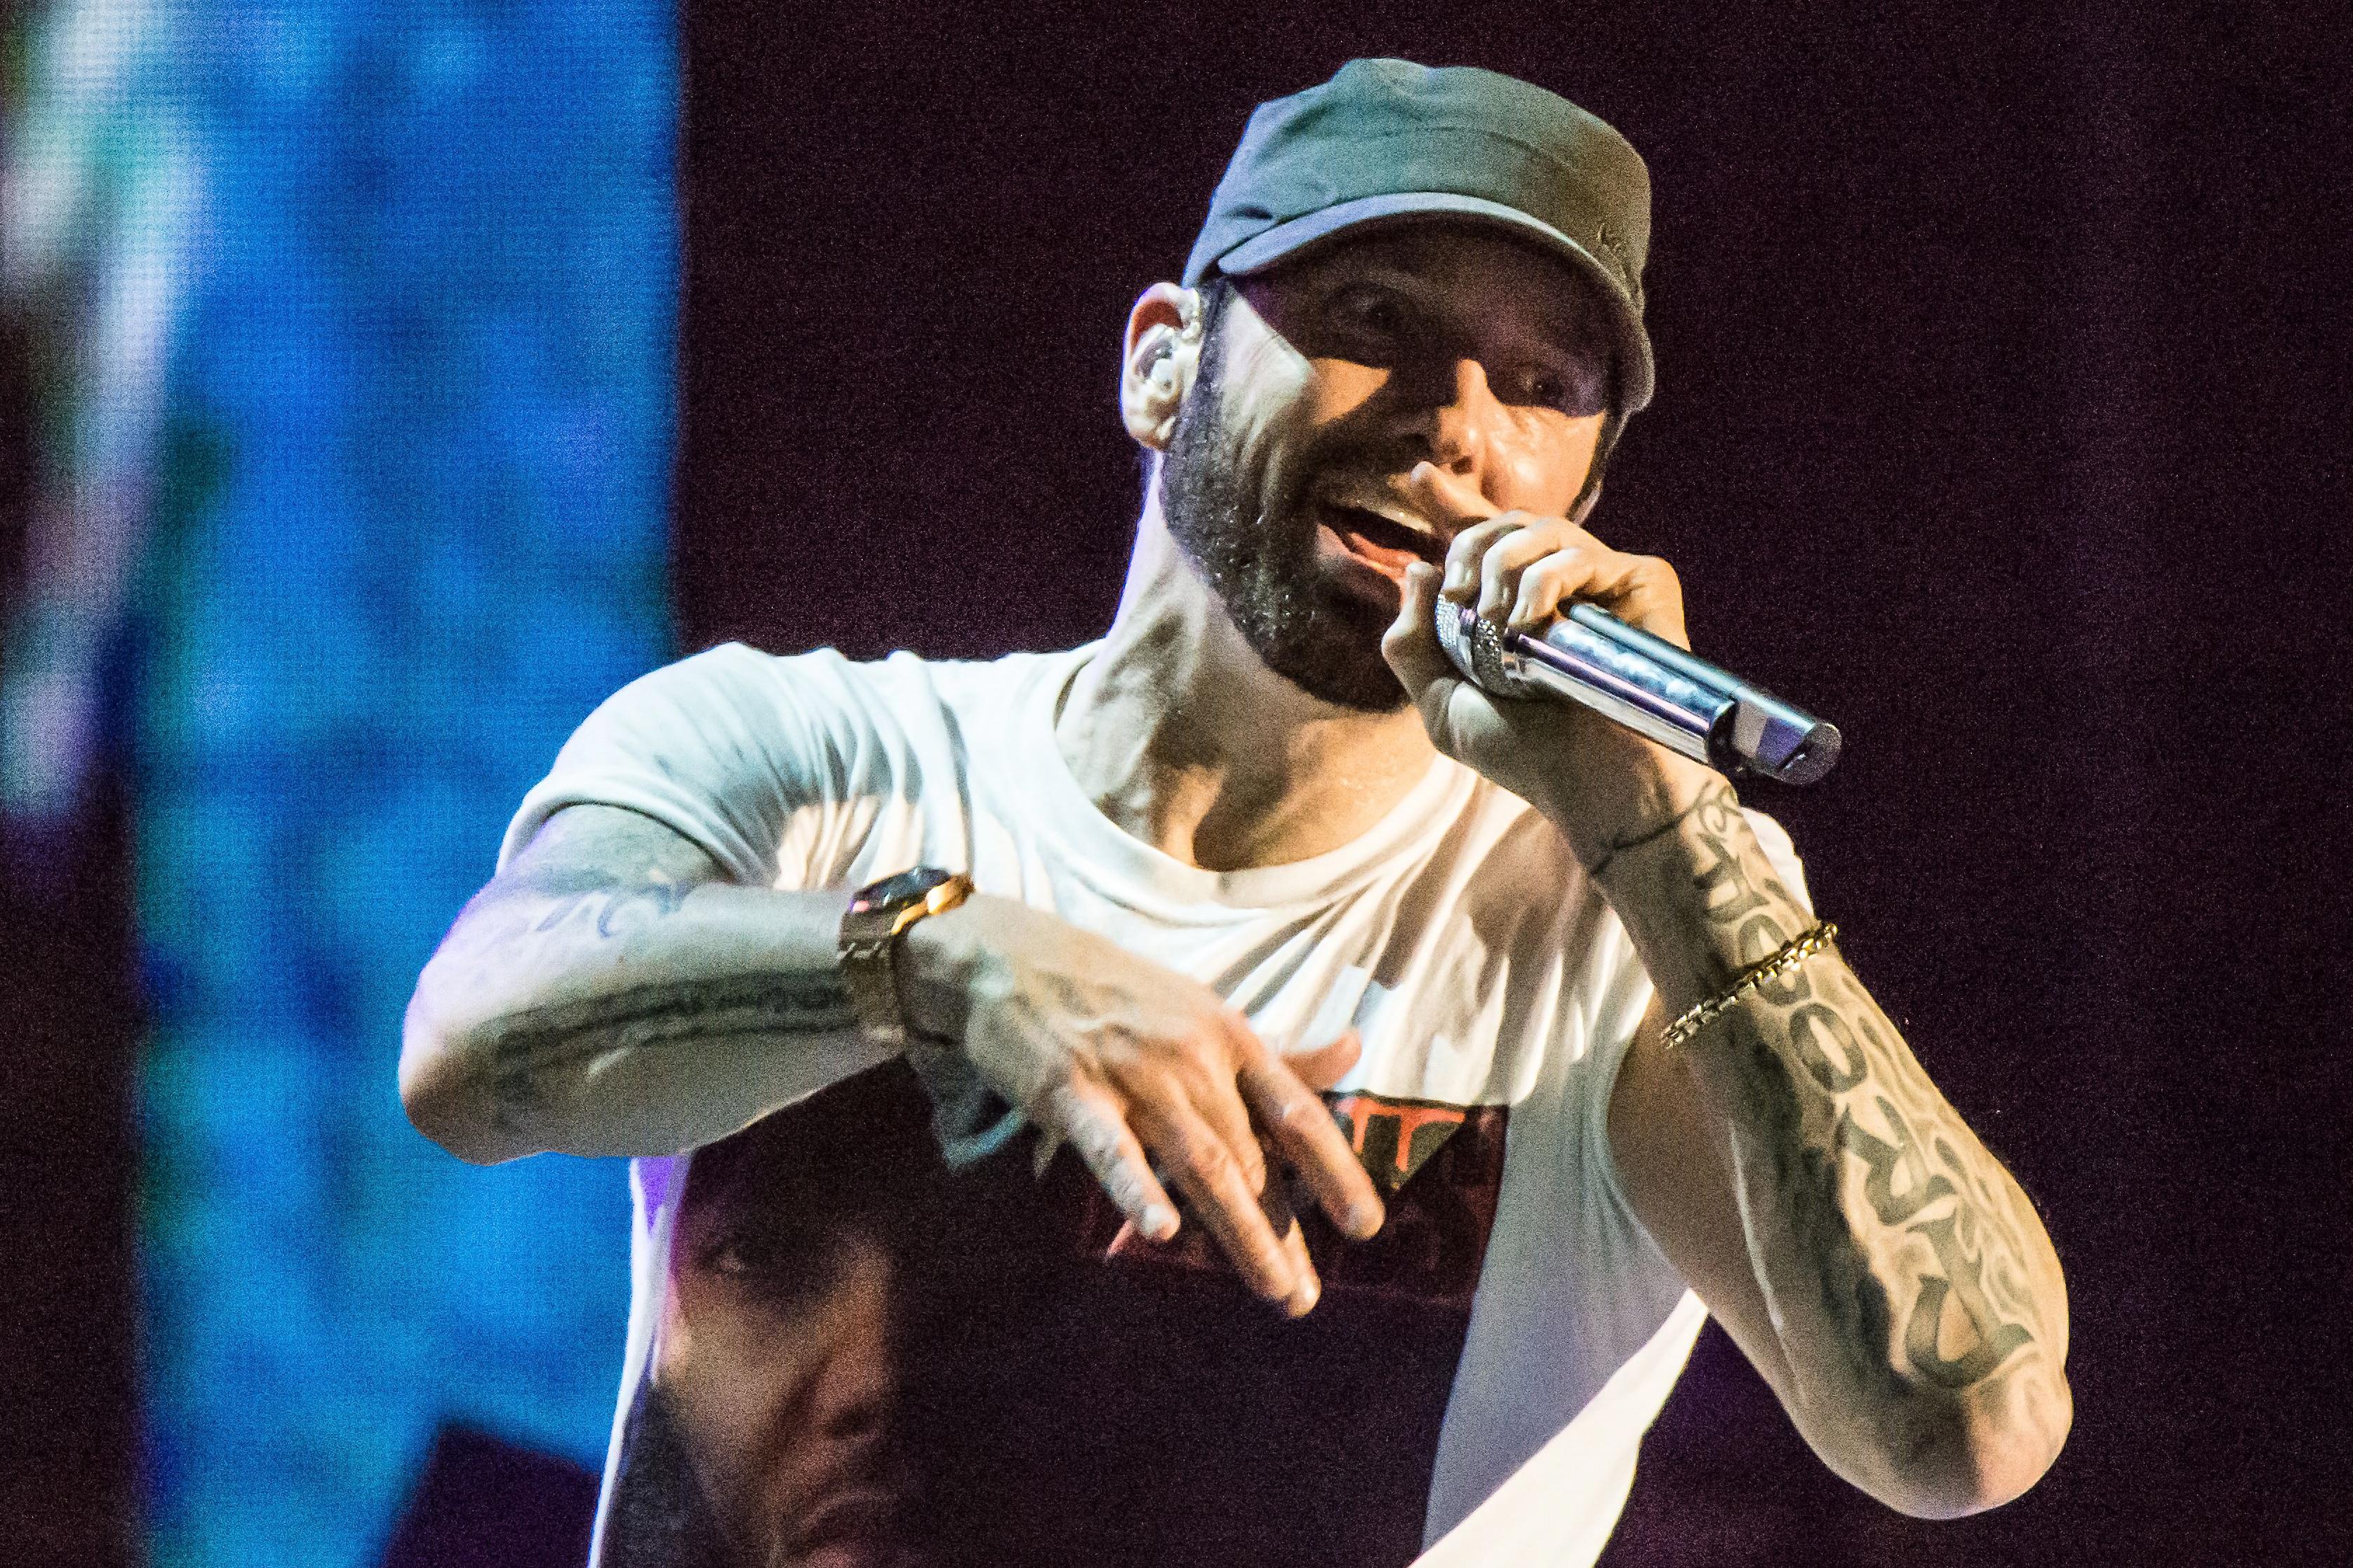 Eminem Producer Explains Why 'Kamikaze' Is a Throwback to